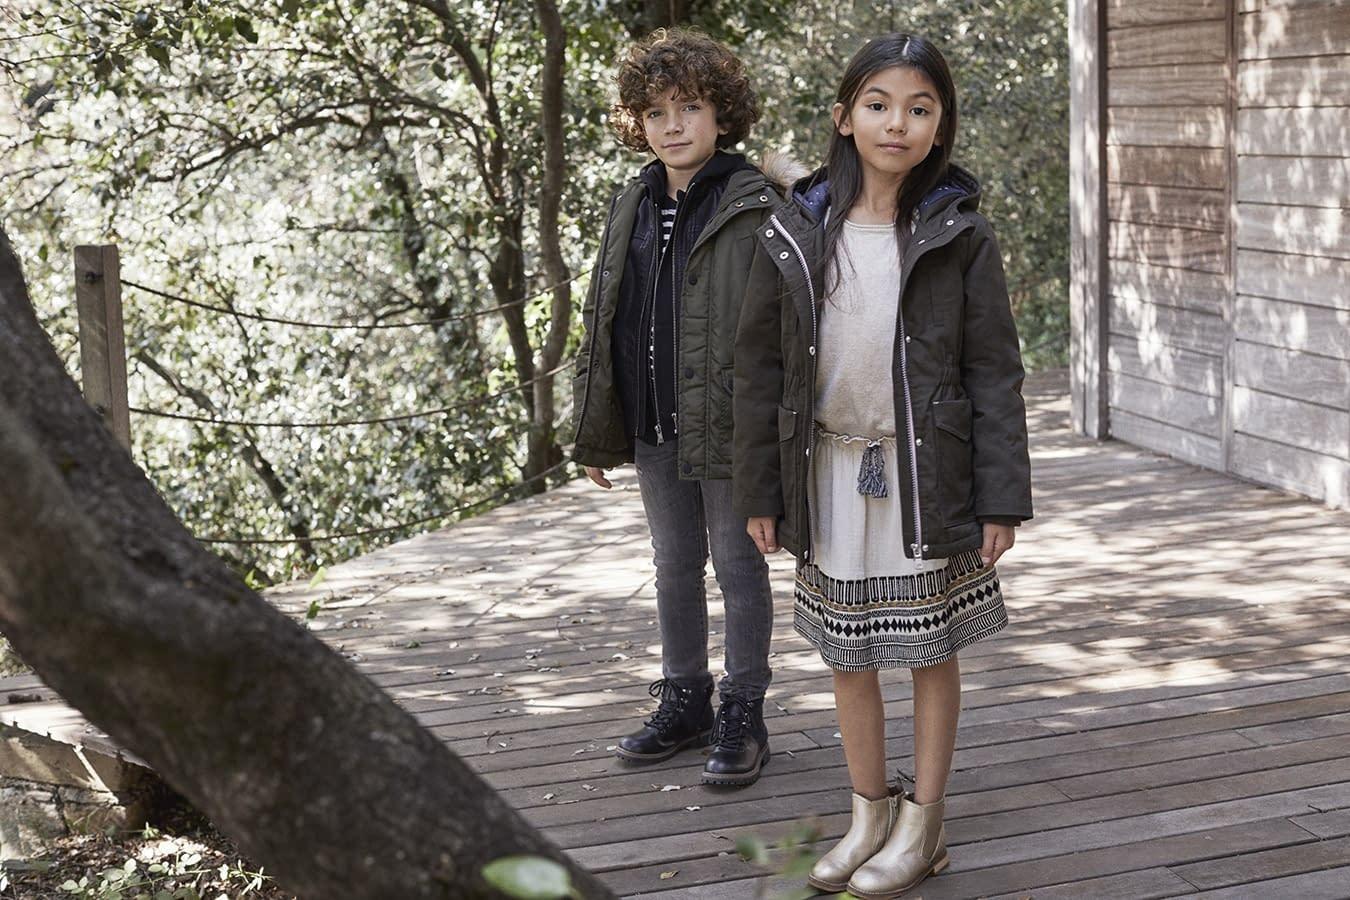 LEFTIES KIDS 8 PHOTO BY ENRIC GALCERAN